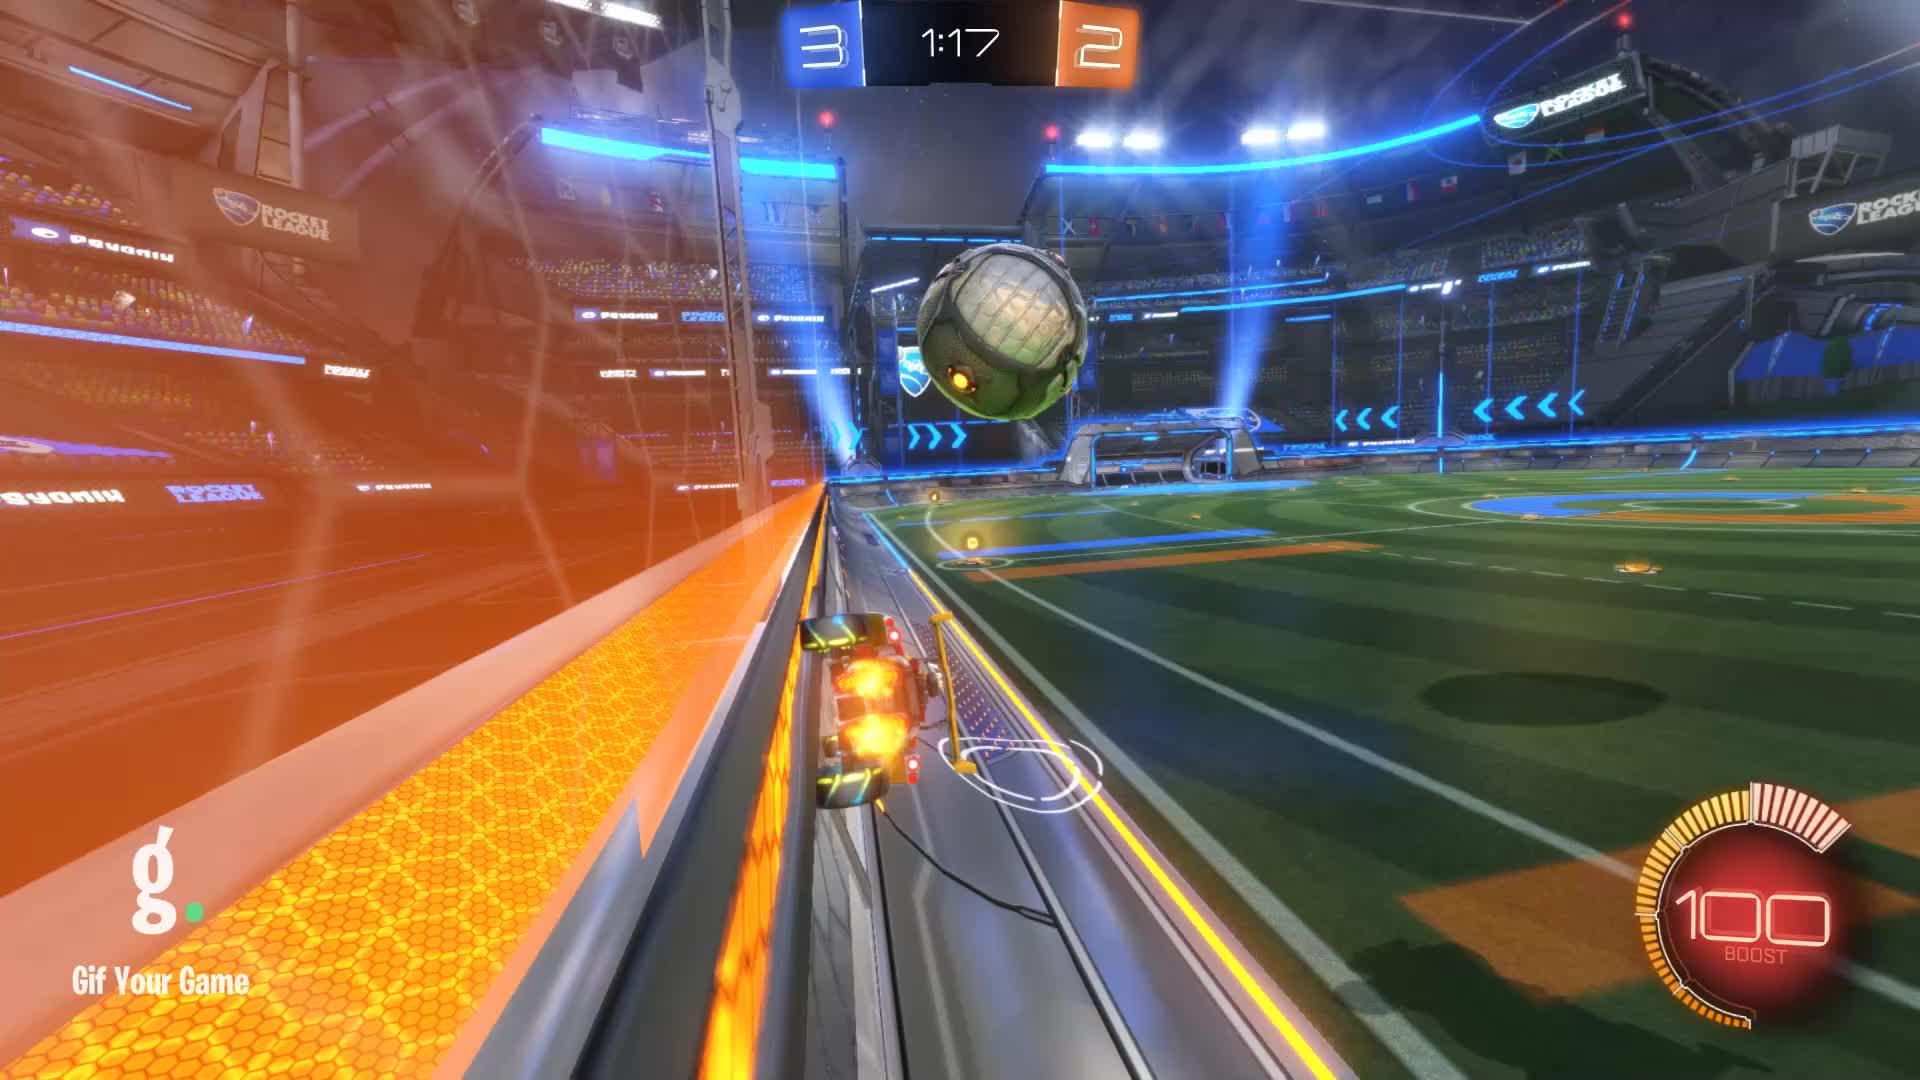 Gif Your Game, GifYourGame, Goal, Goldfish, Rocket League, RocketLeague, Goal 6: Goldfish GIFs